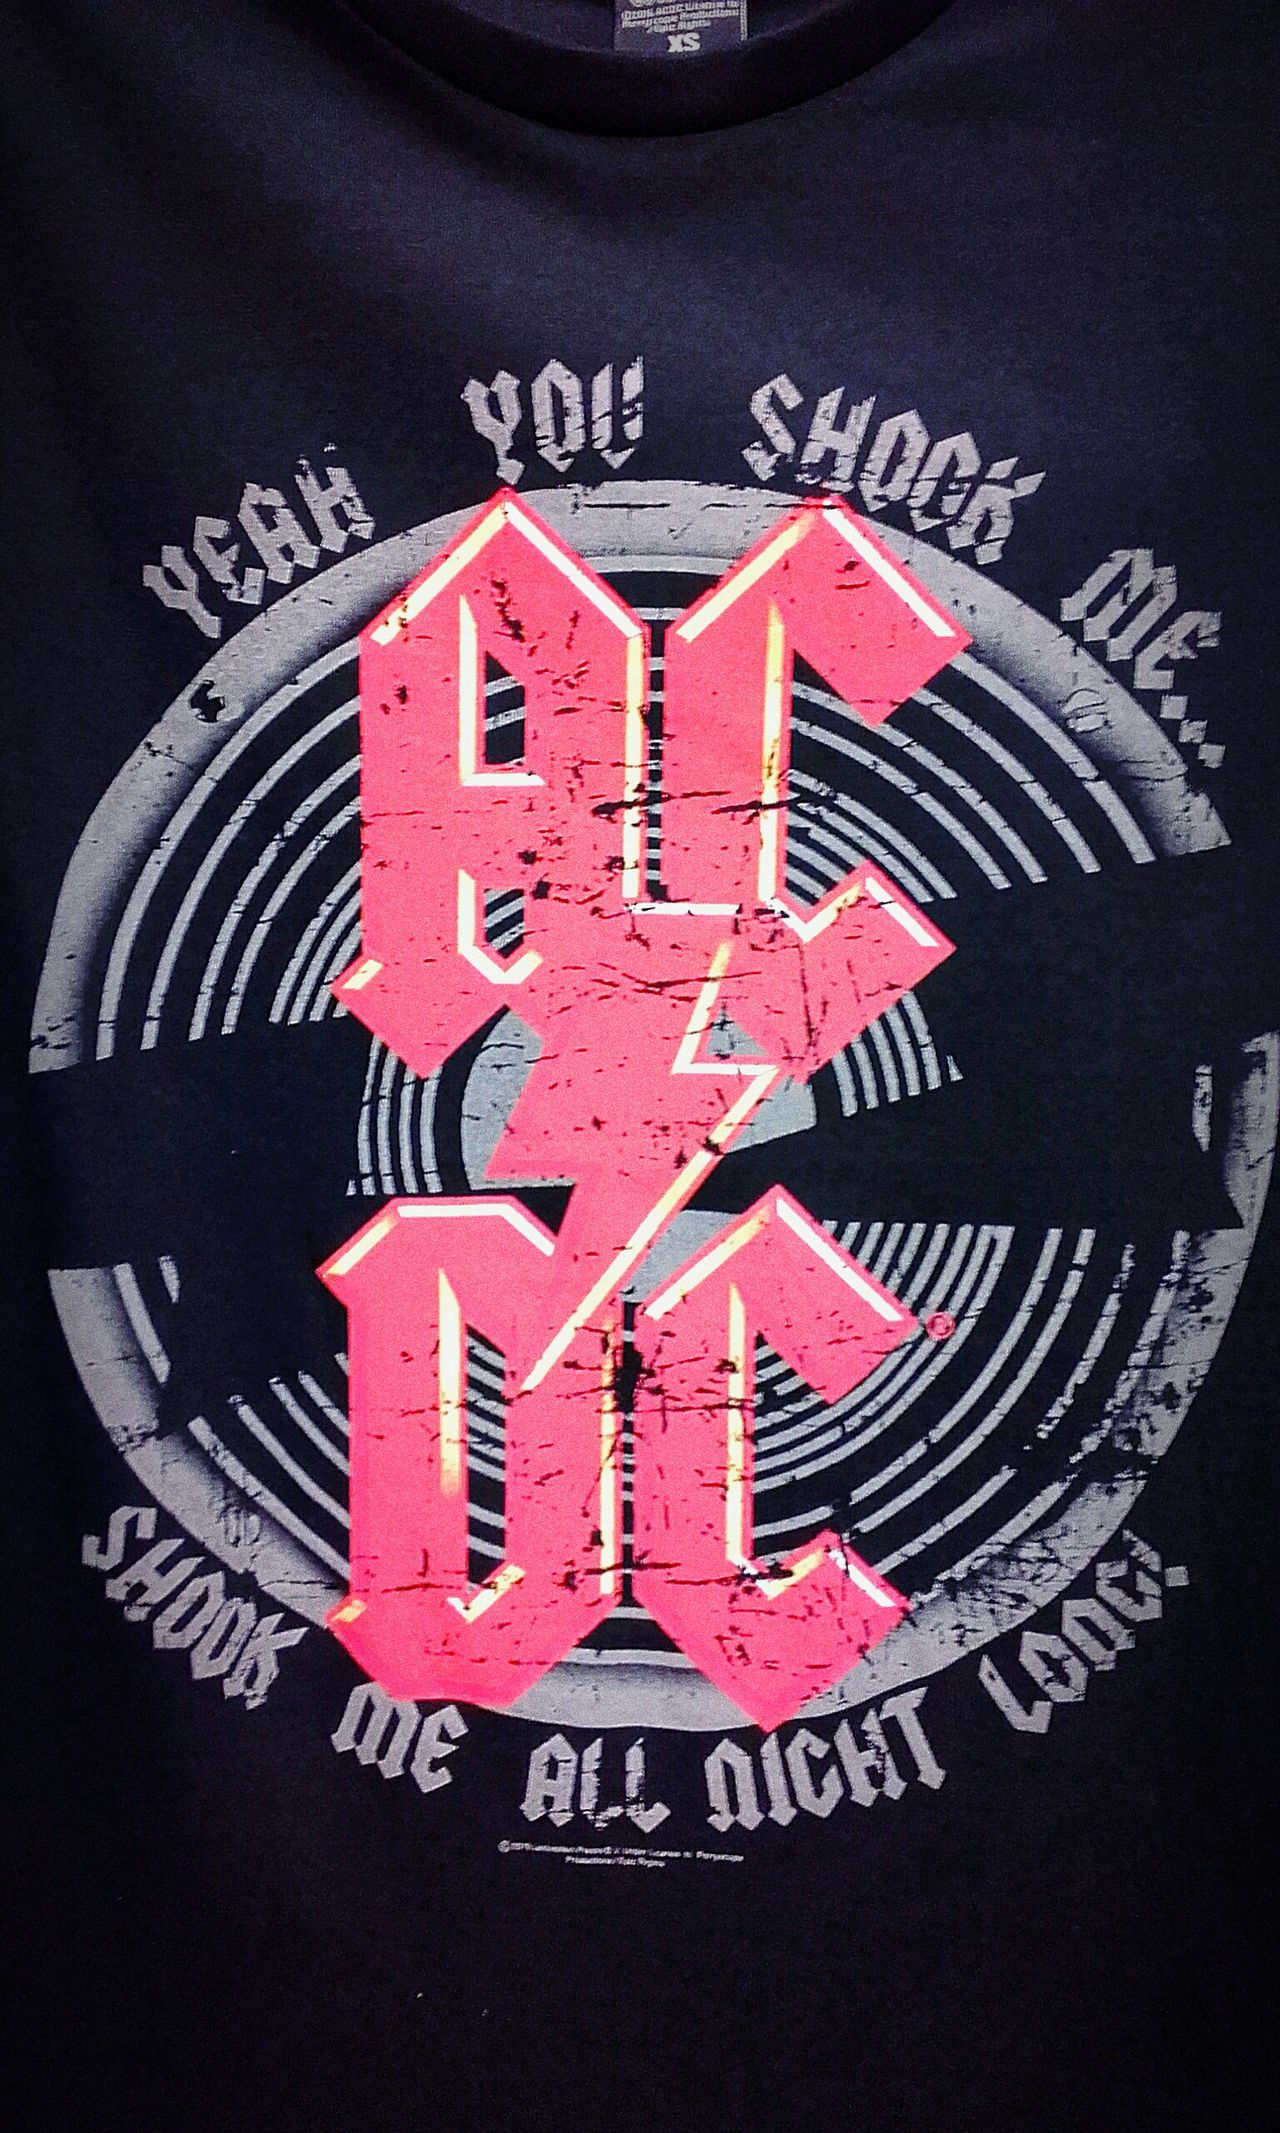 Acdctshirt AC/DC Tshirt Teeshirt T Shirt Collection Tshirts Tshirtporn Tshirtcollection Teeshirts Tshirt♡ T Shirts T Shirt ACDC AC~DC Ac Dc  Acca/dacca Accadacca Bandshirt Youshookmeallnightlong Tees Rock And Roll Rock'n'Roll Bandshirts Tee Shirt Tee Shirts